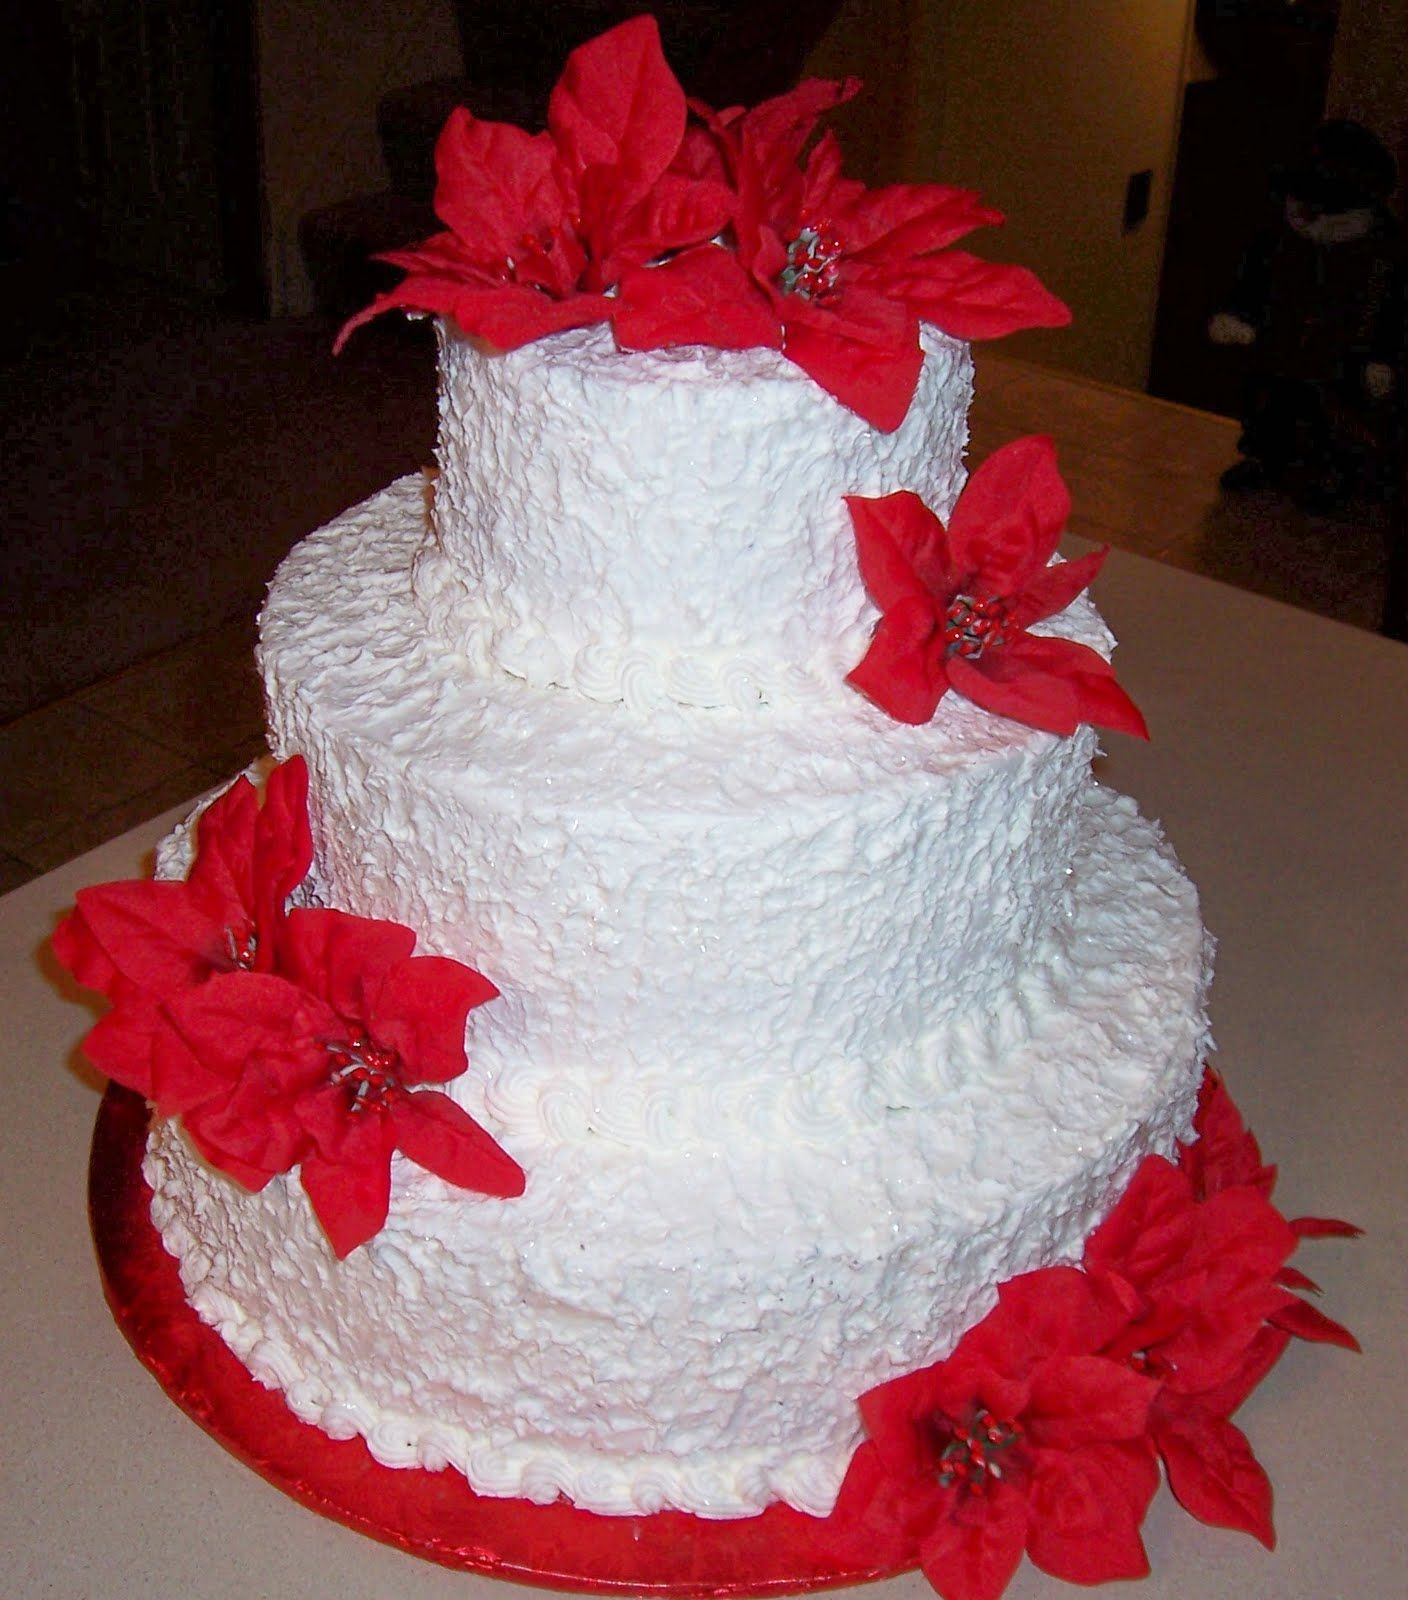 My Wedding Dreams & Ideas: Christmas Wedding Cakes!!! | Wedding ...